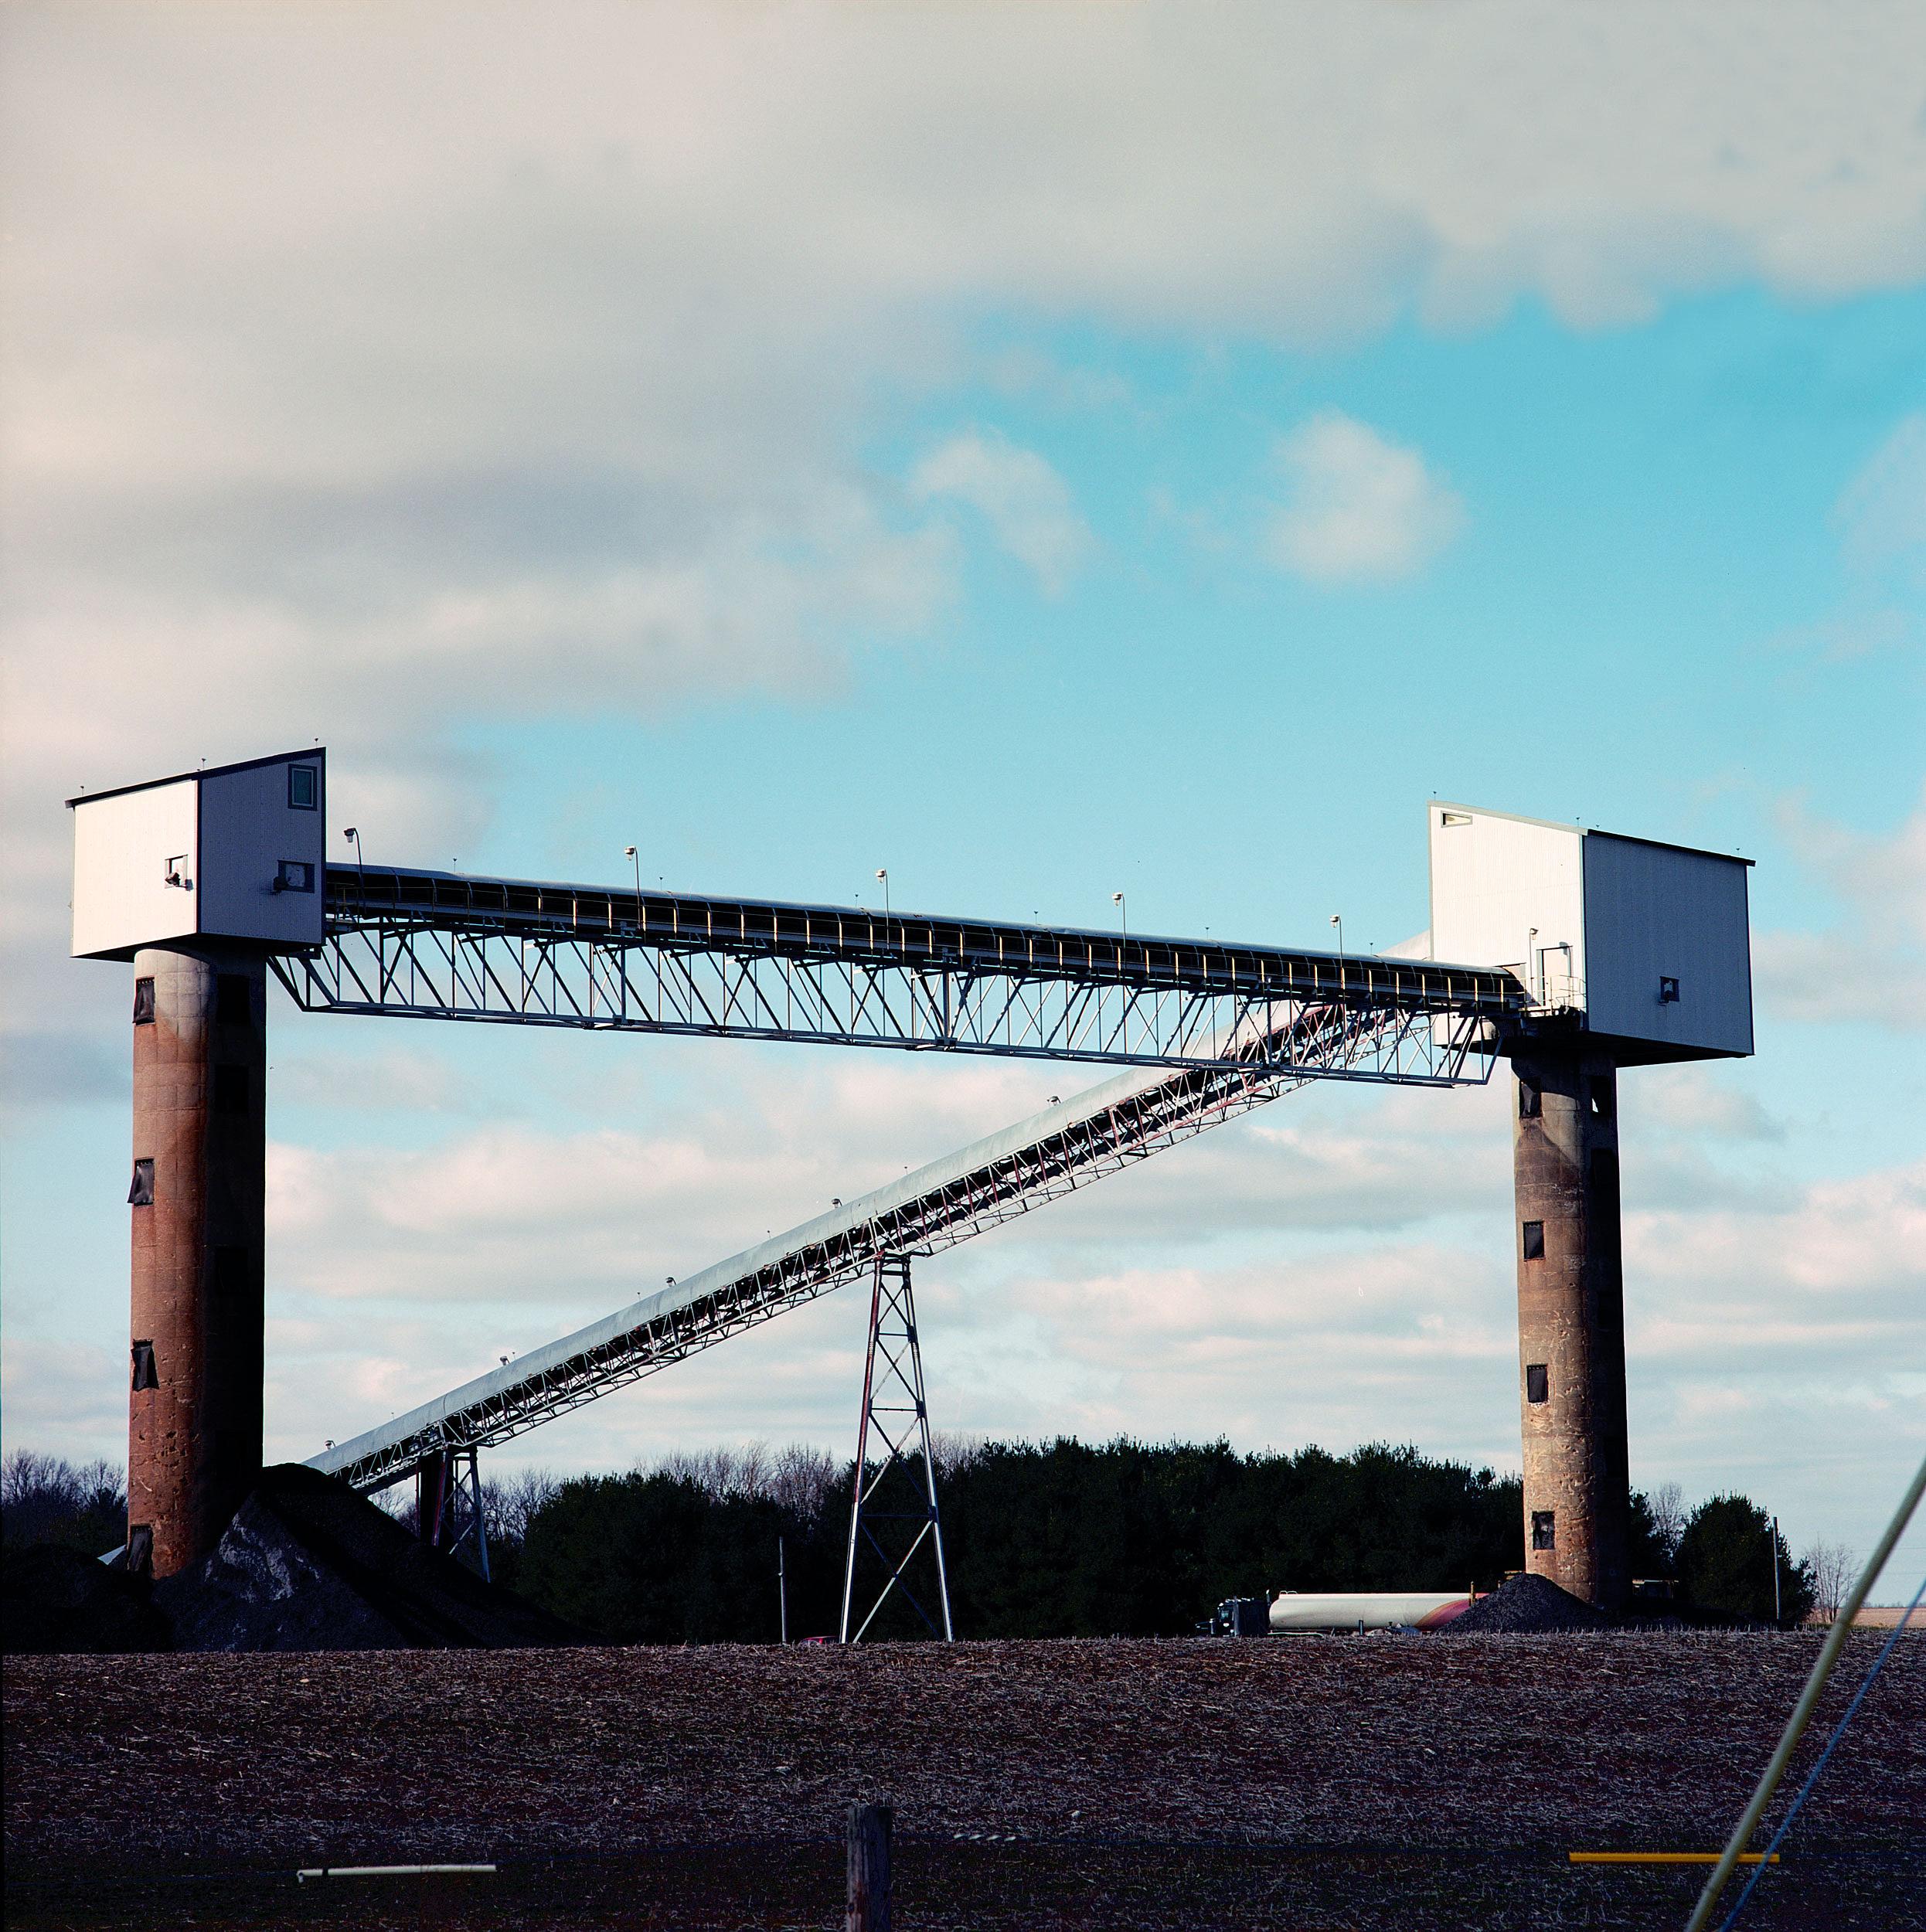 Wheatland Generating Plant, Wheatland, Indiana.